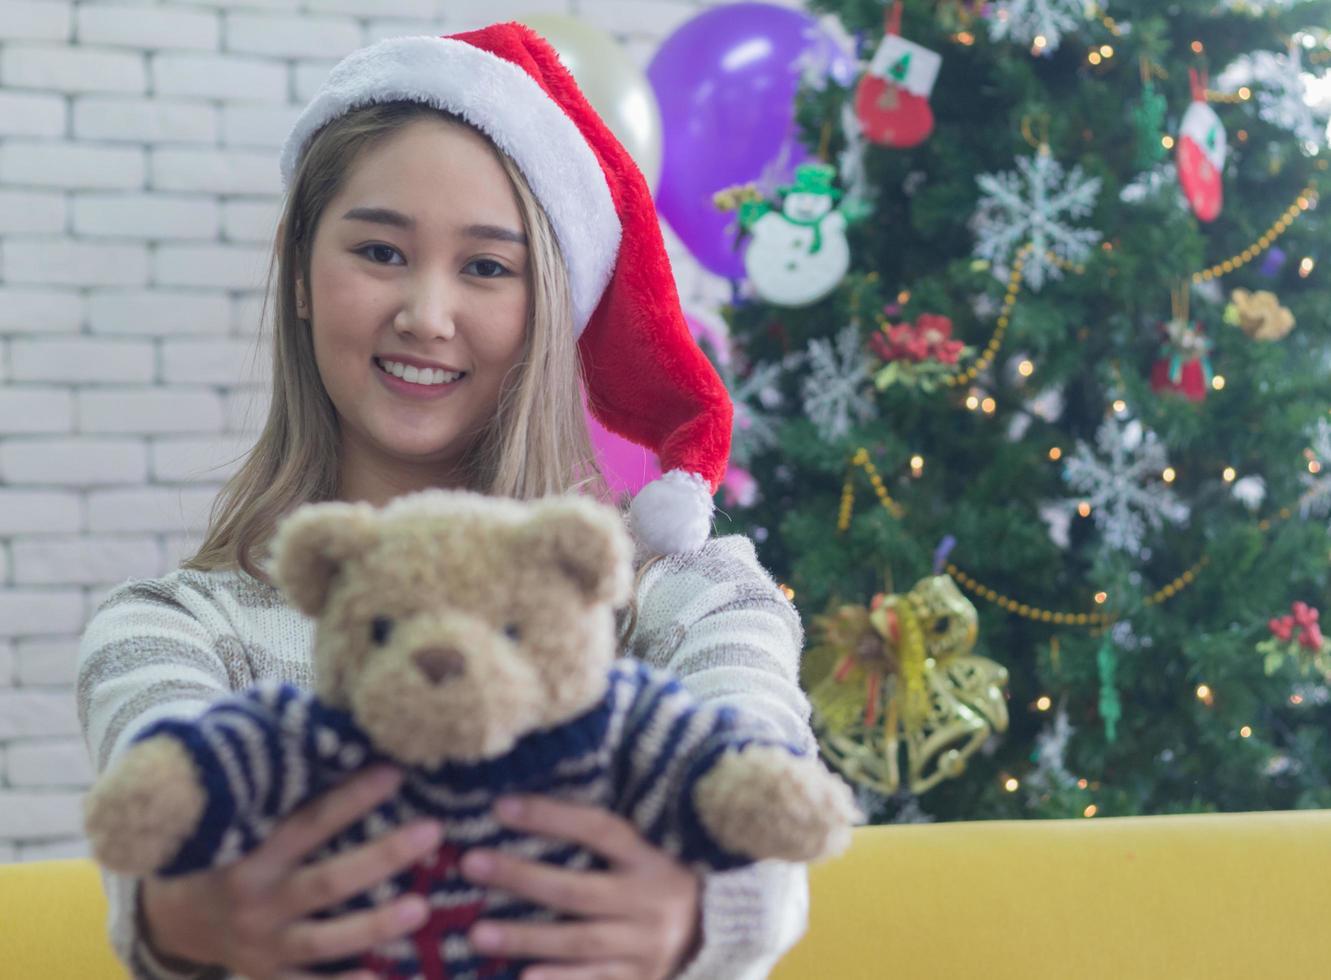 Woman holding a teddy bear wearing a Santa hat photo